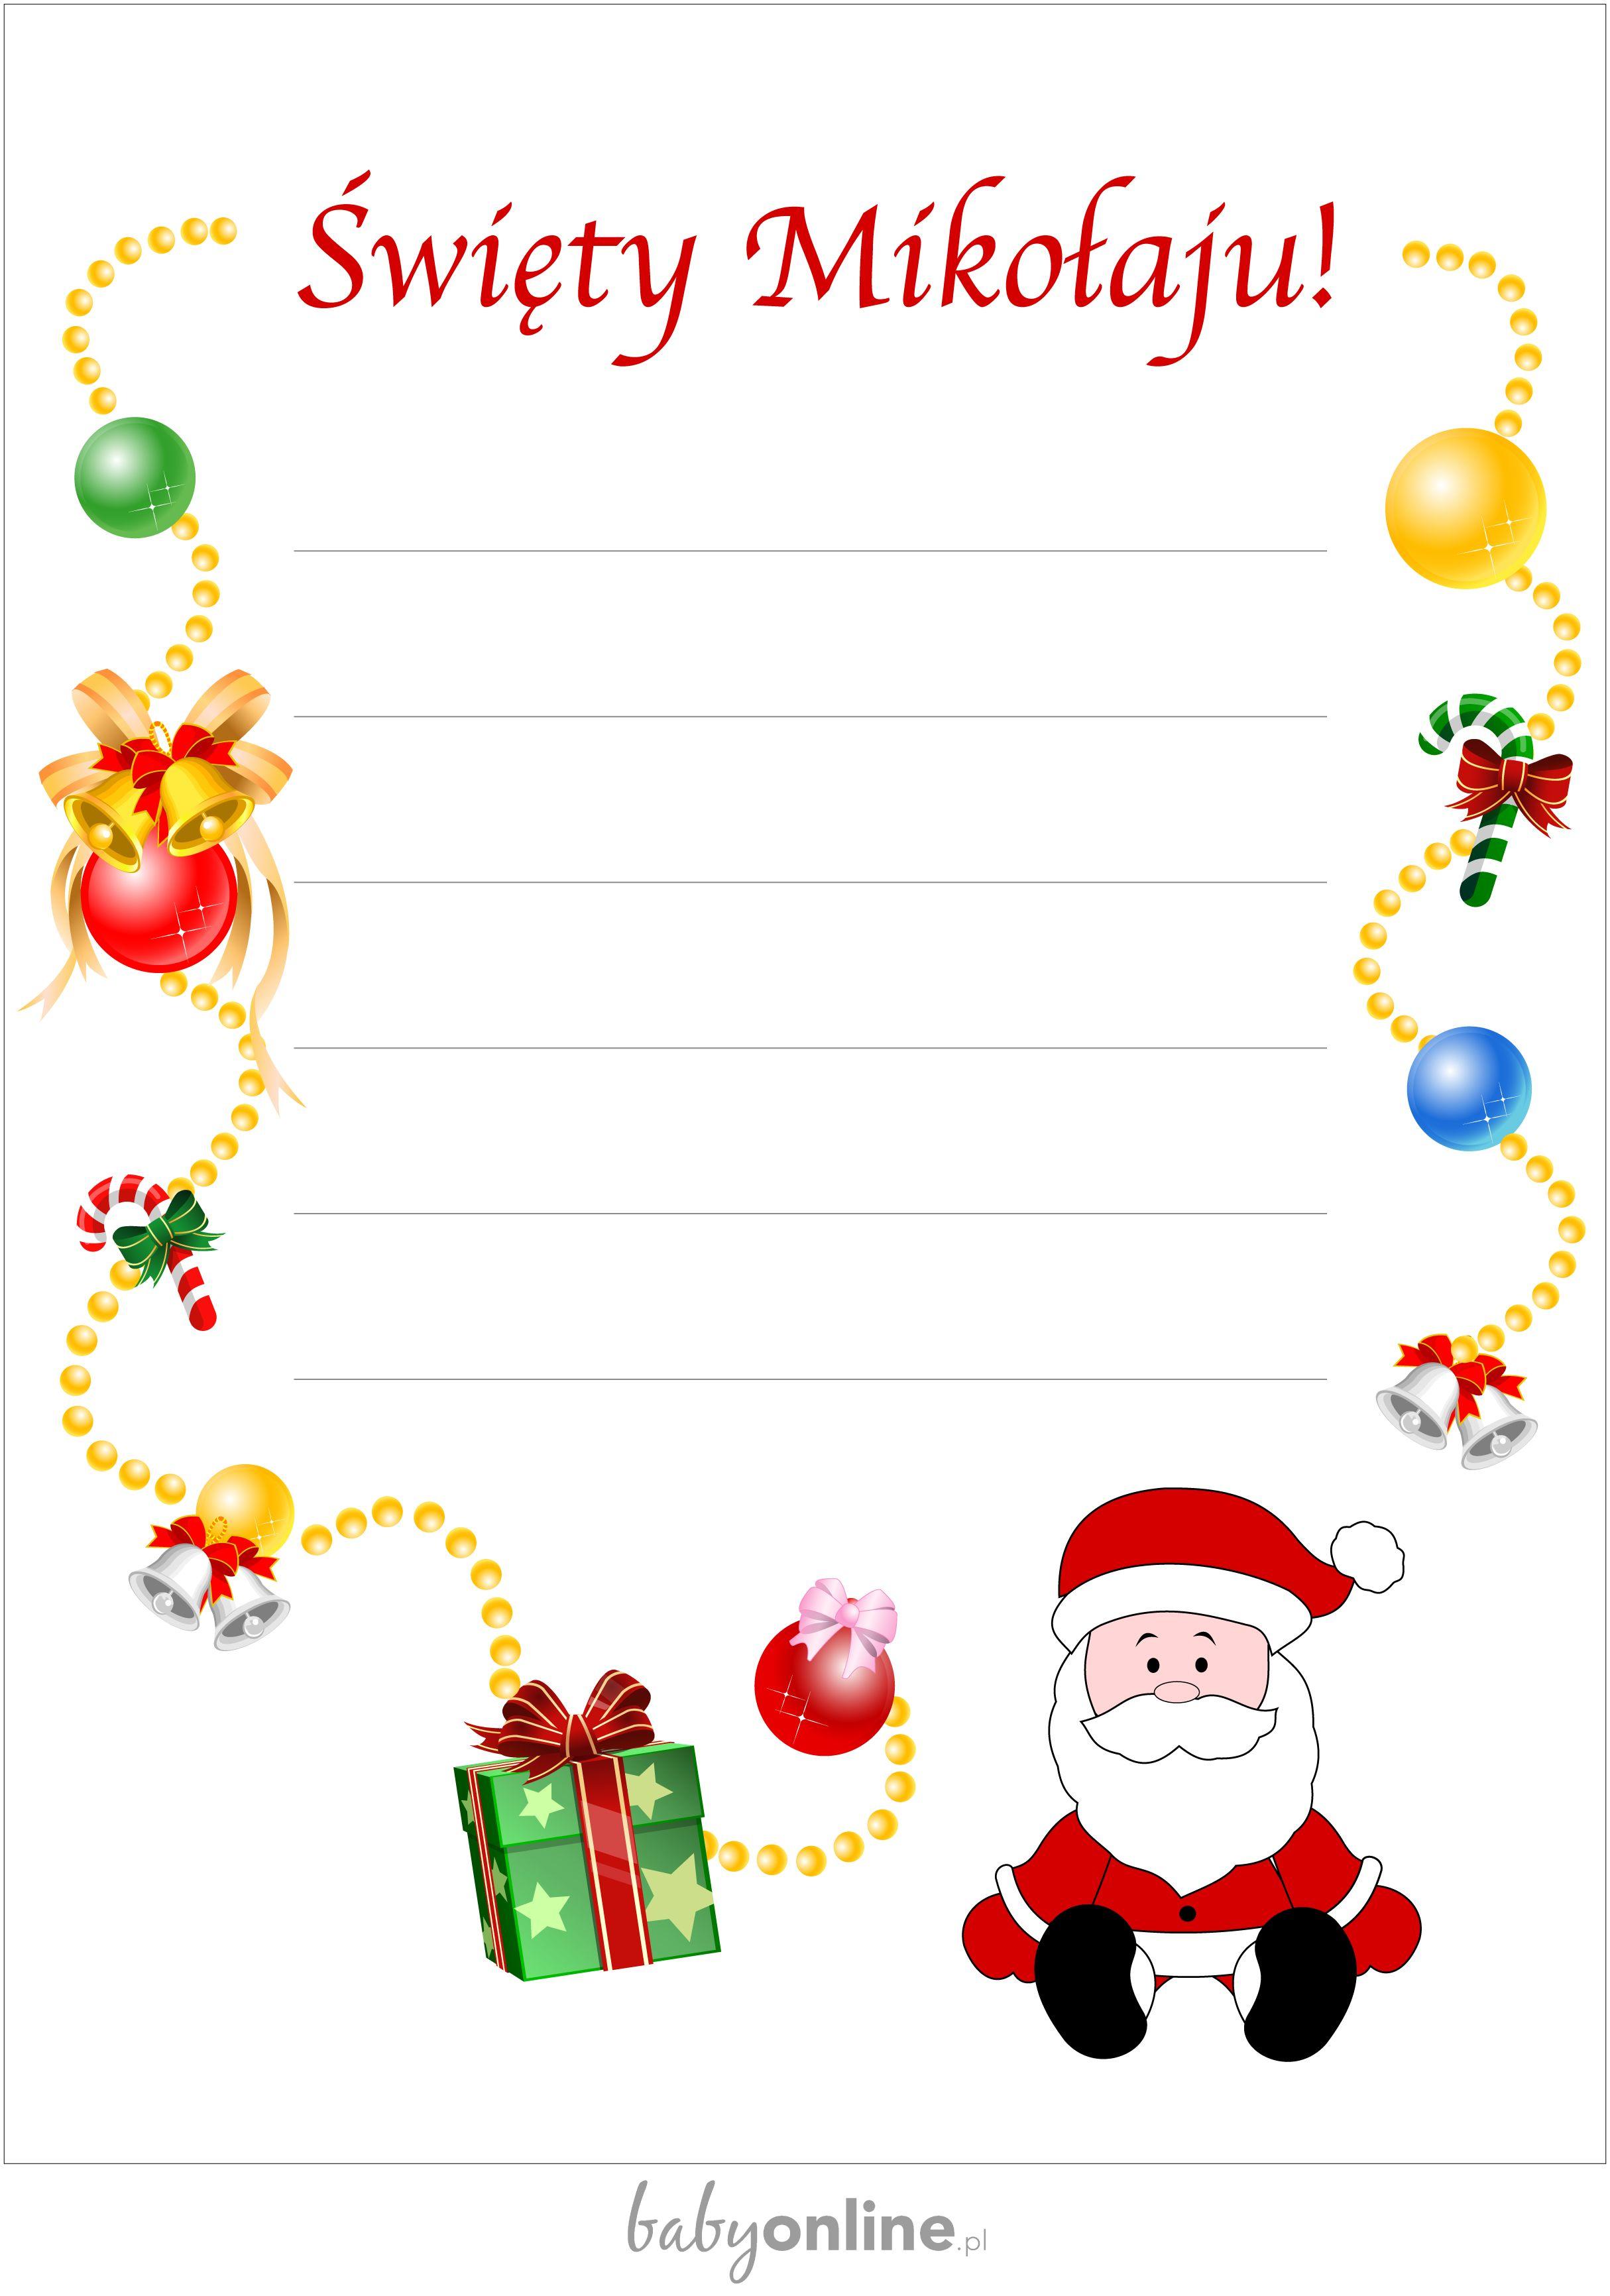 List Do Swietego Mikolaja Do Druku List Do Swietego Mikolaja Babyonline Crafts For Kids Holidays And Events Christmas Diy